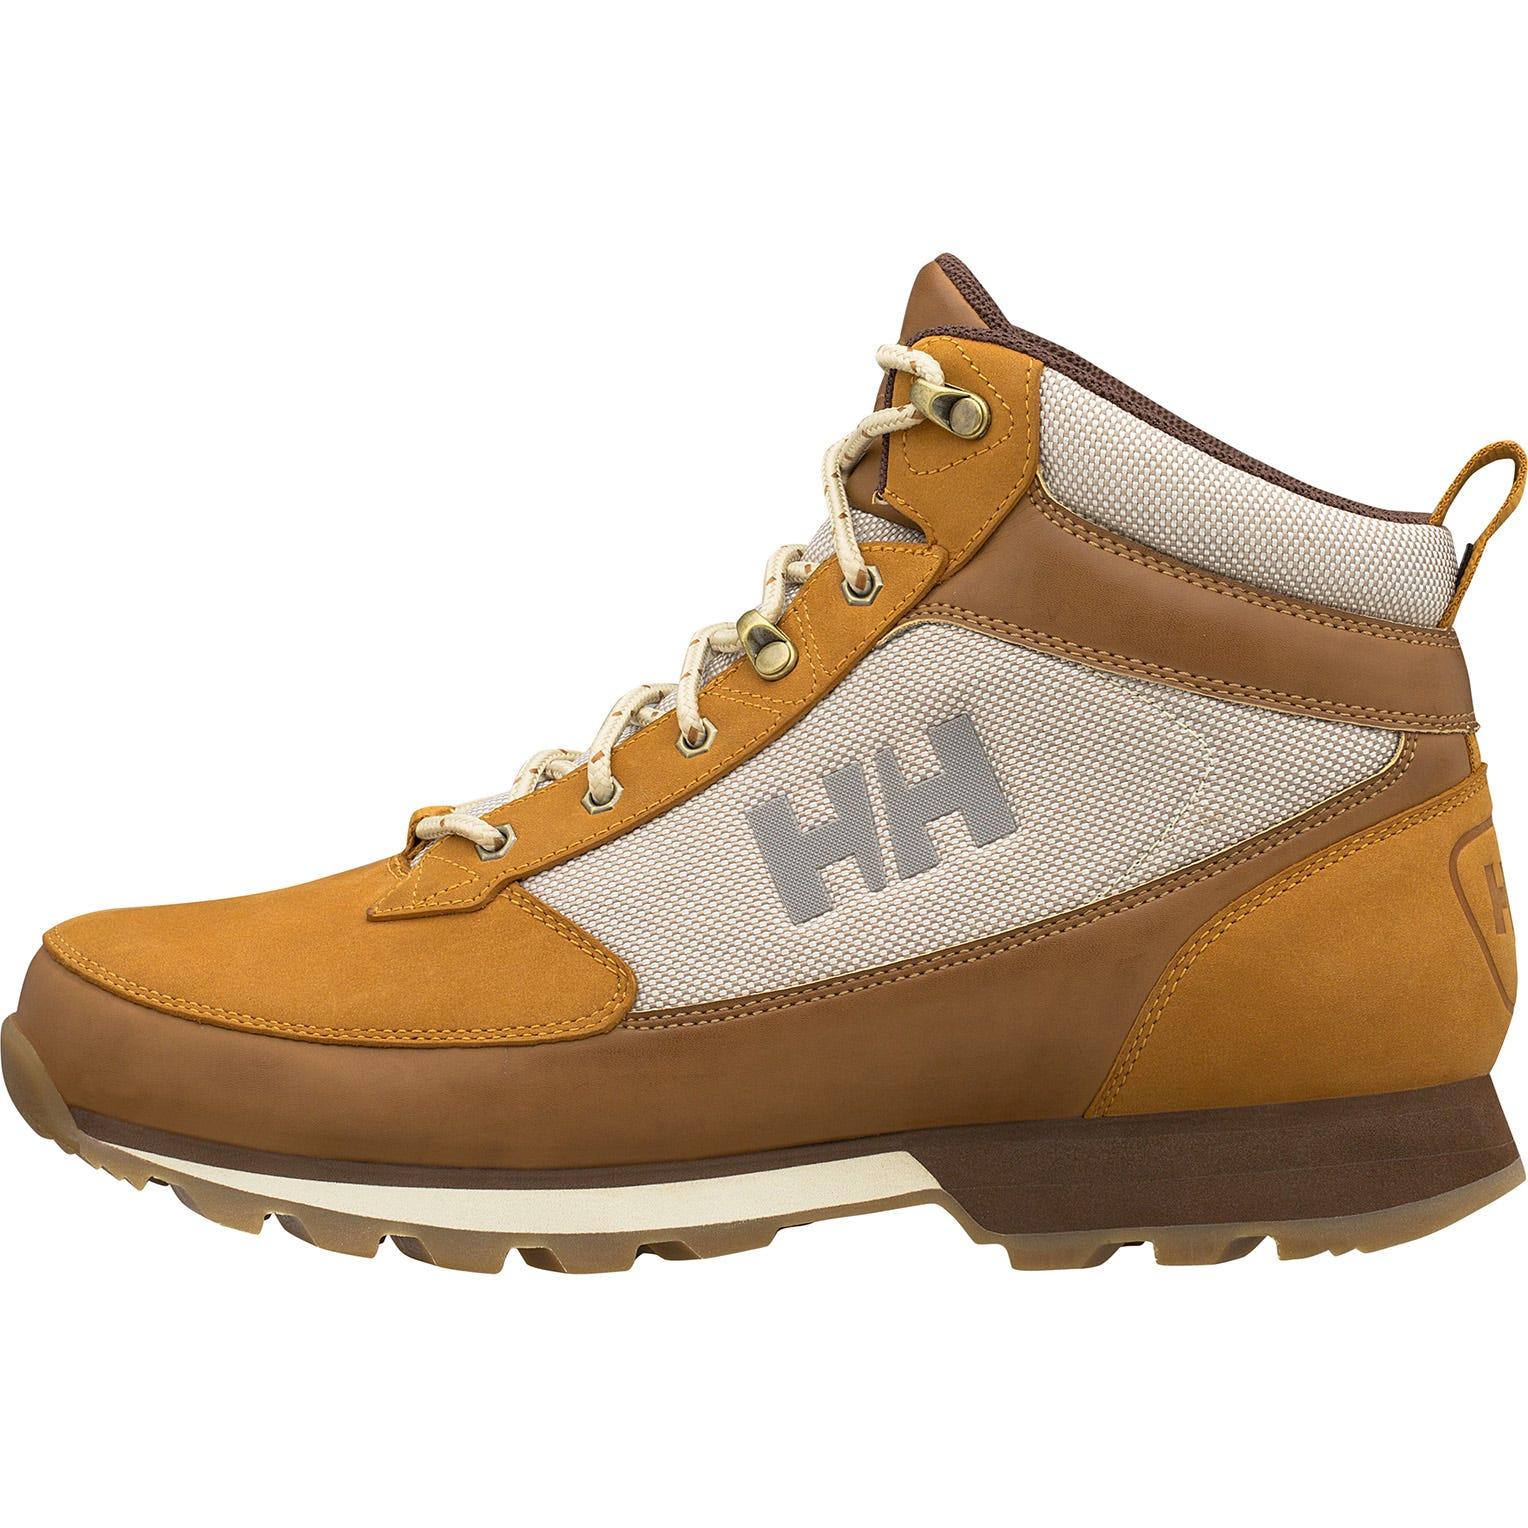 Helly Hansen Chilcotin Mens Winter Boot Brown 40/7